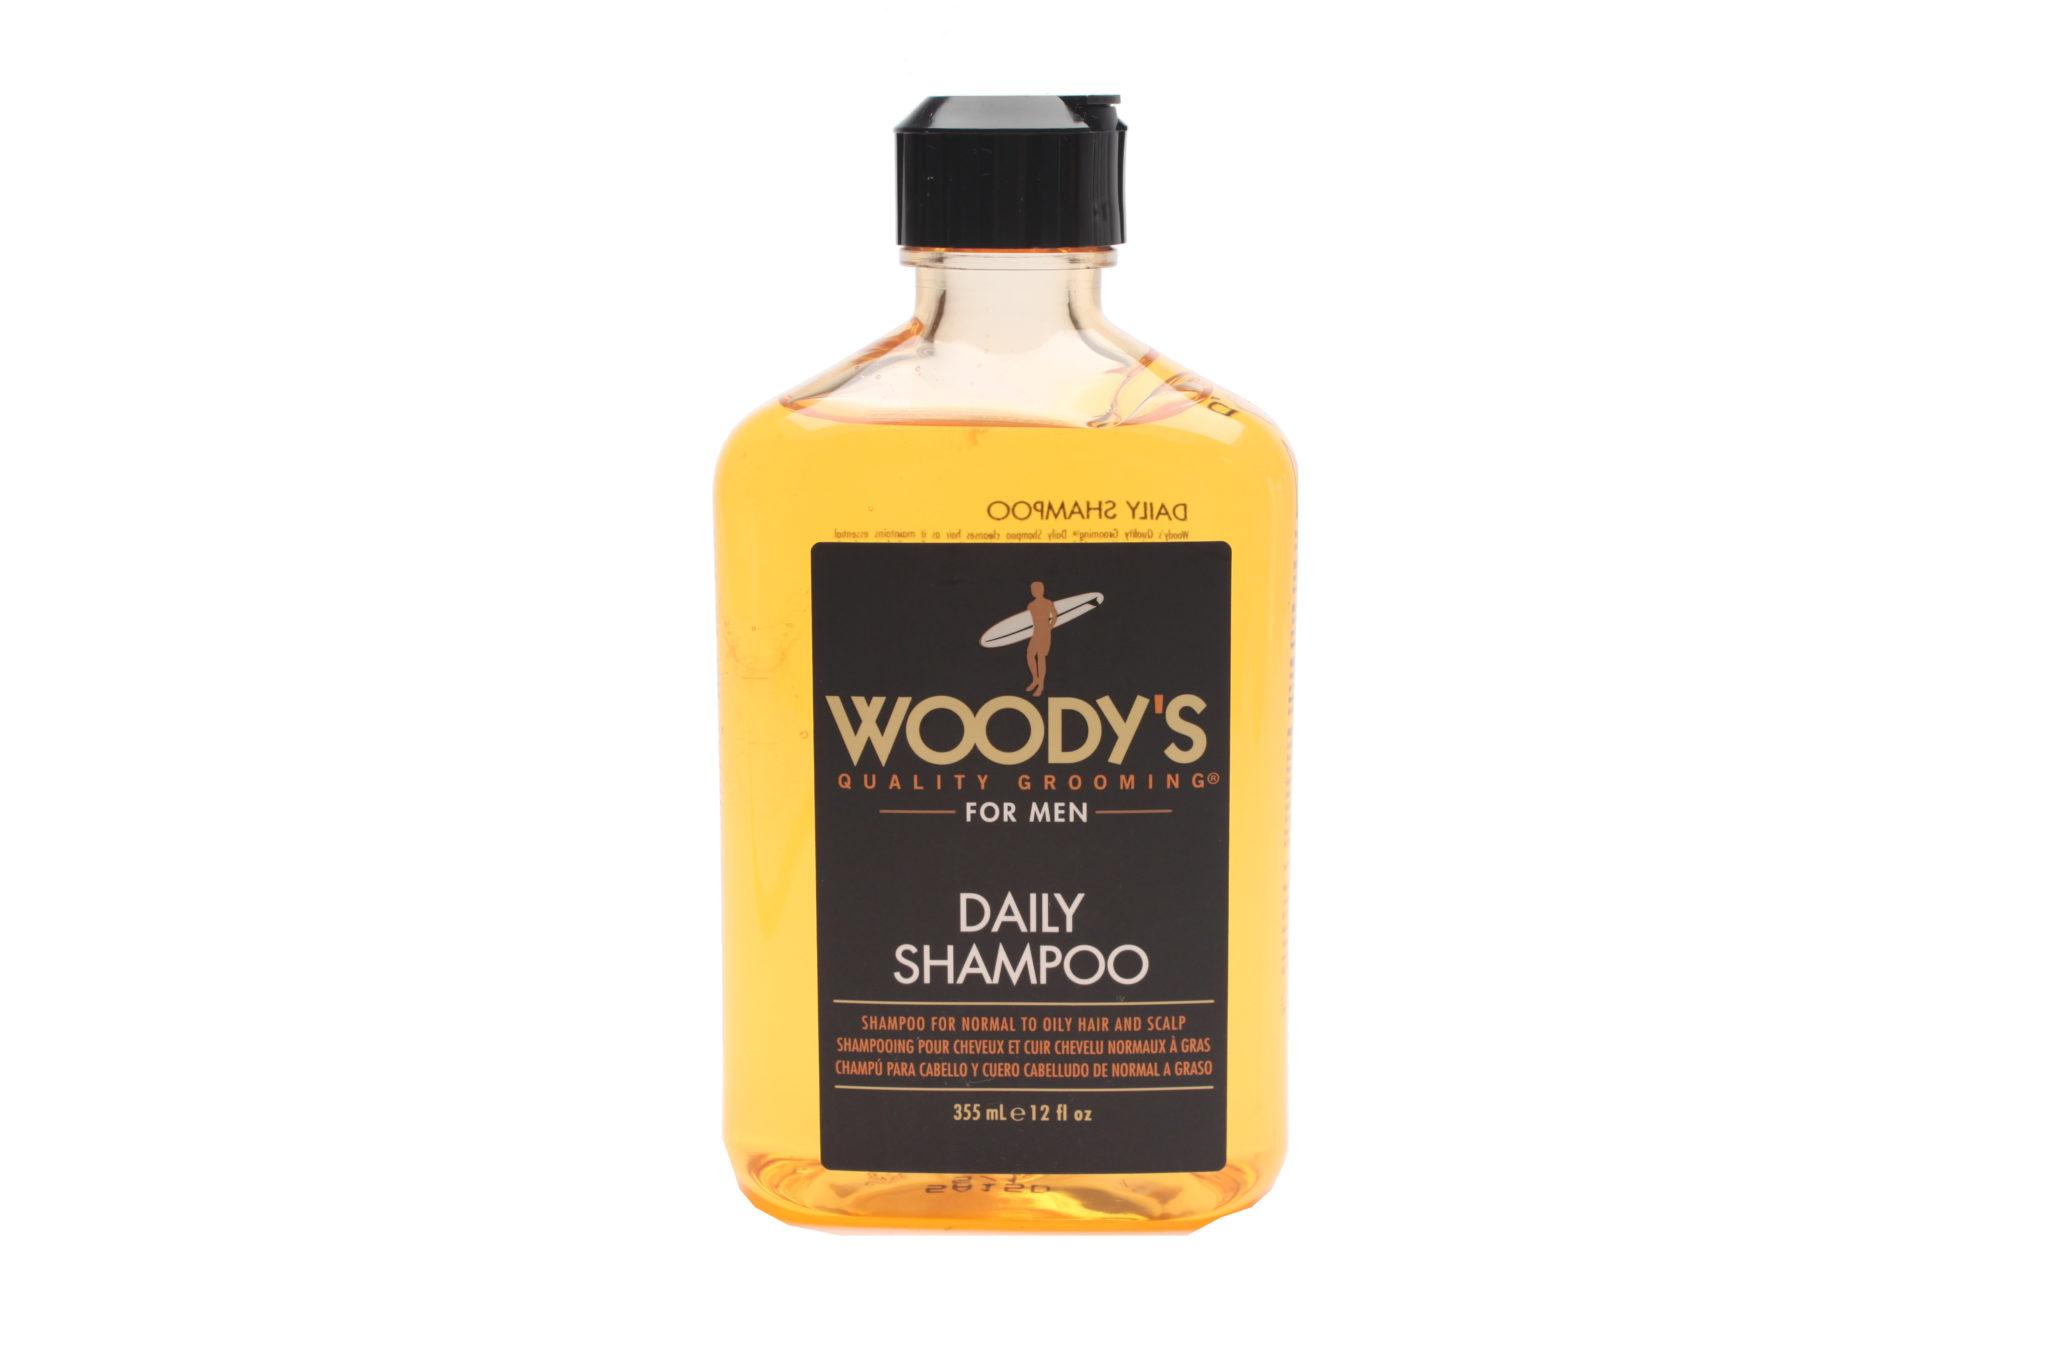 34248 Daily Shampoo 12 oz Front